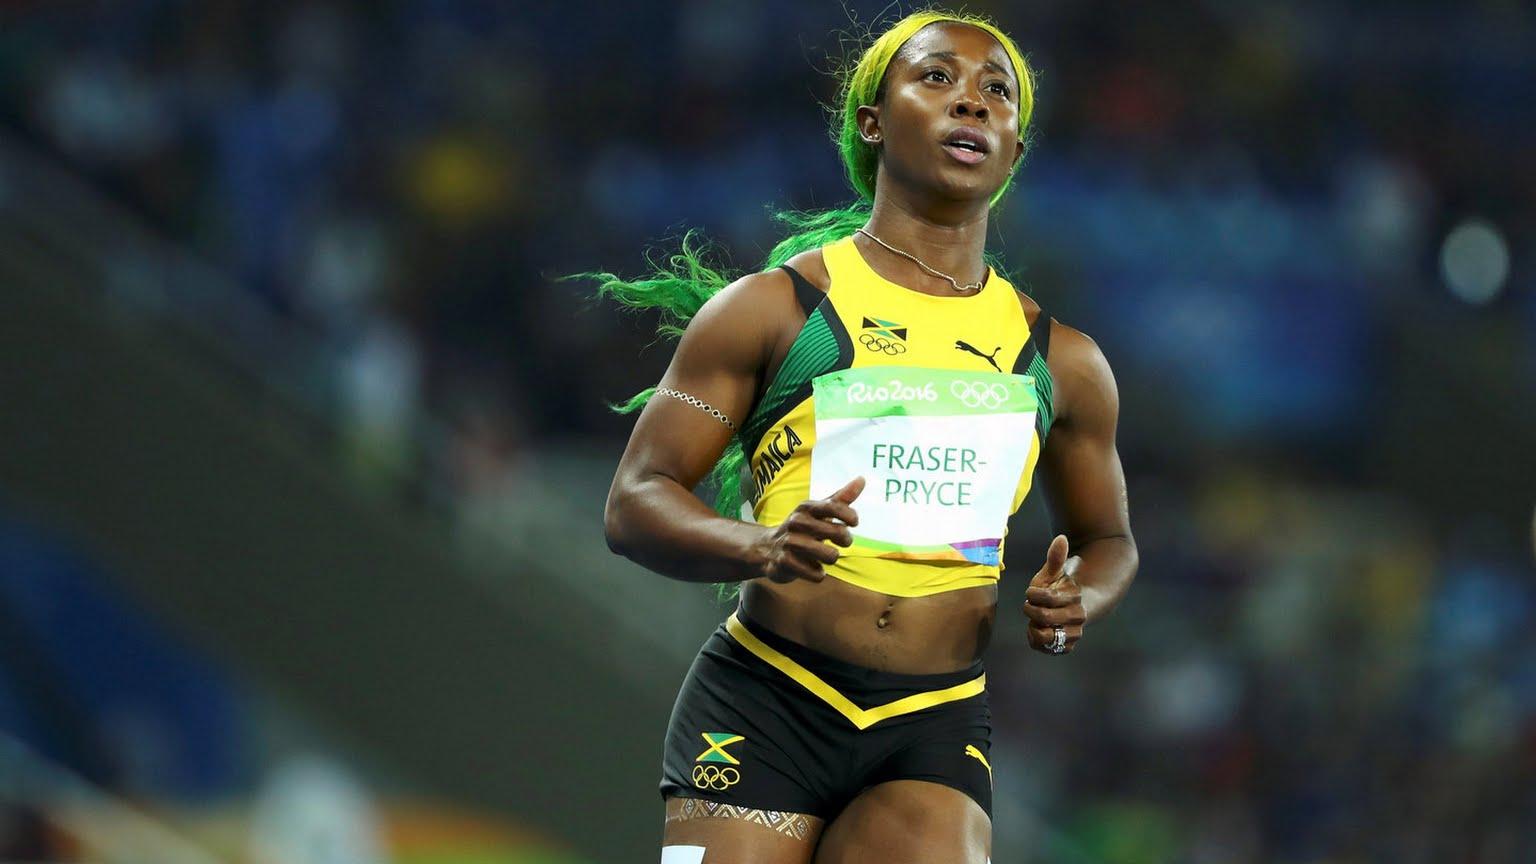 Shelly Ann Fraser-Pryce of Jamaica